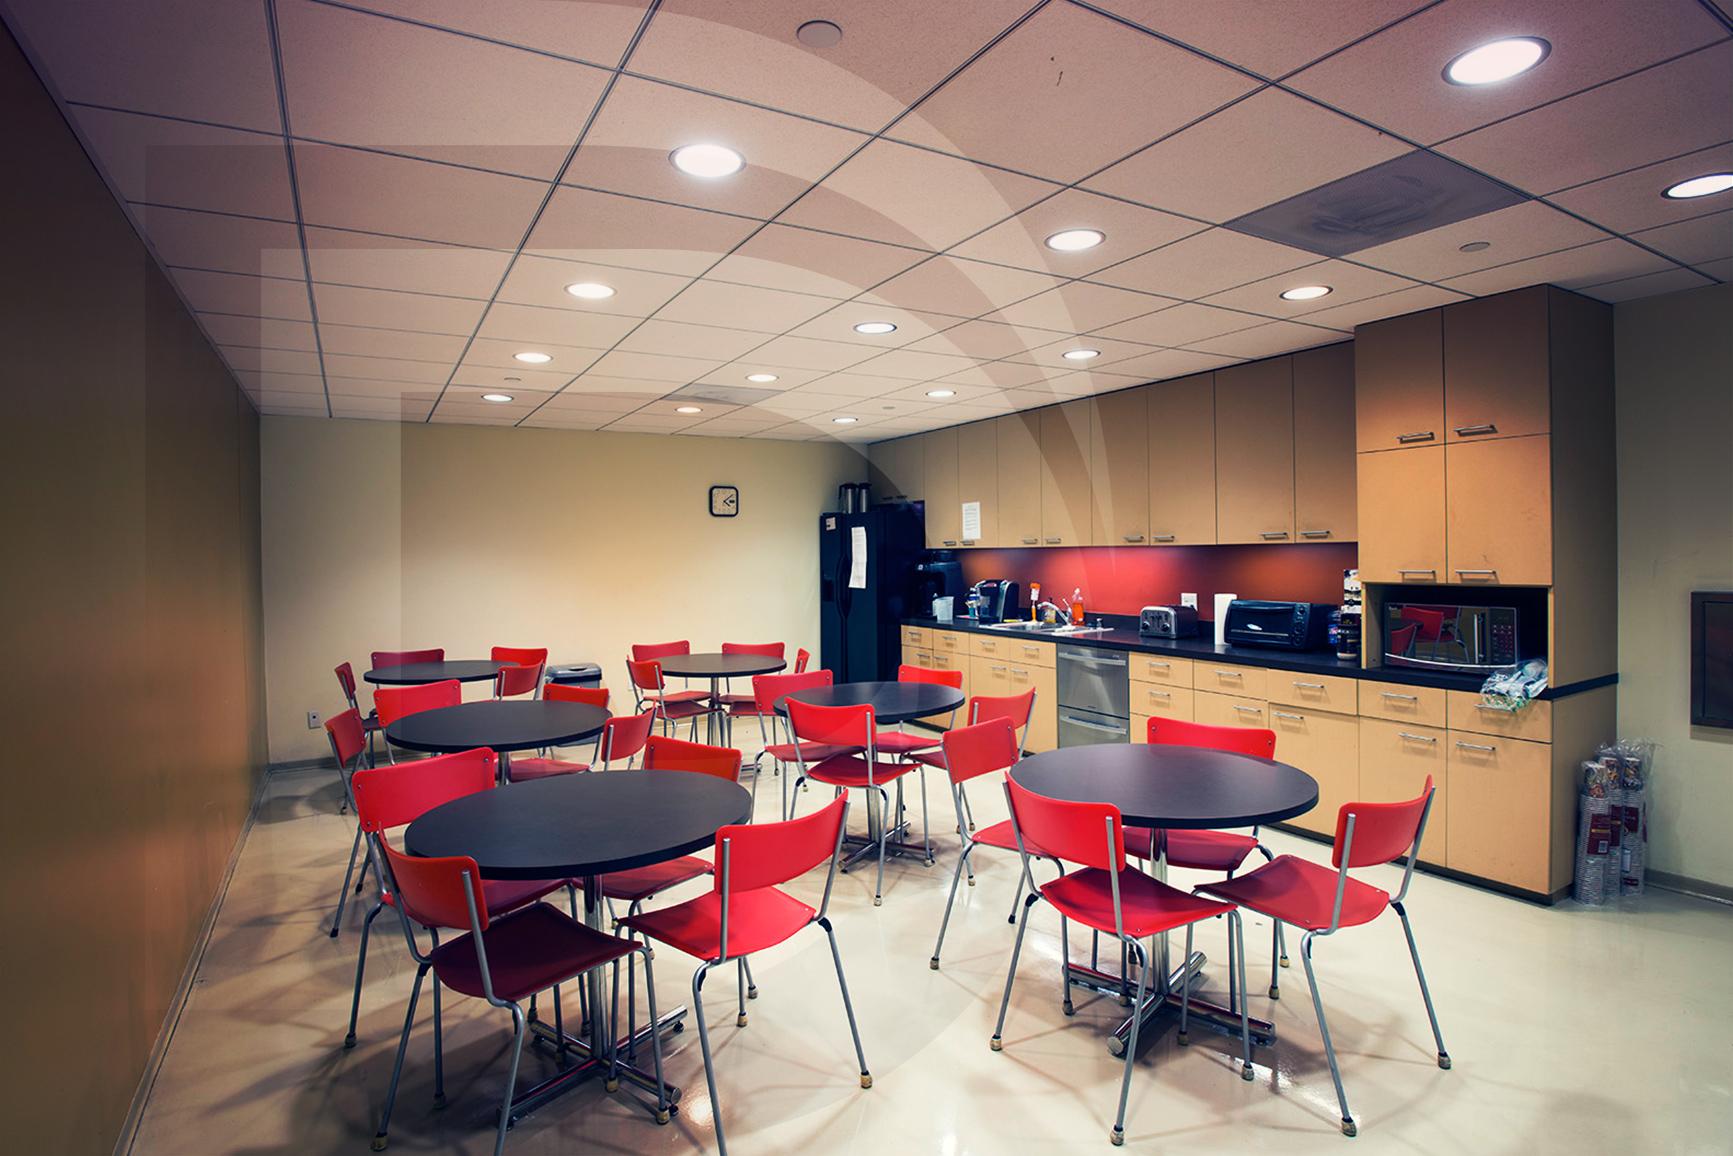 lunch-room.jpg